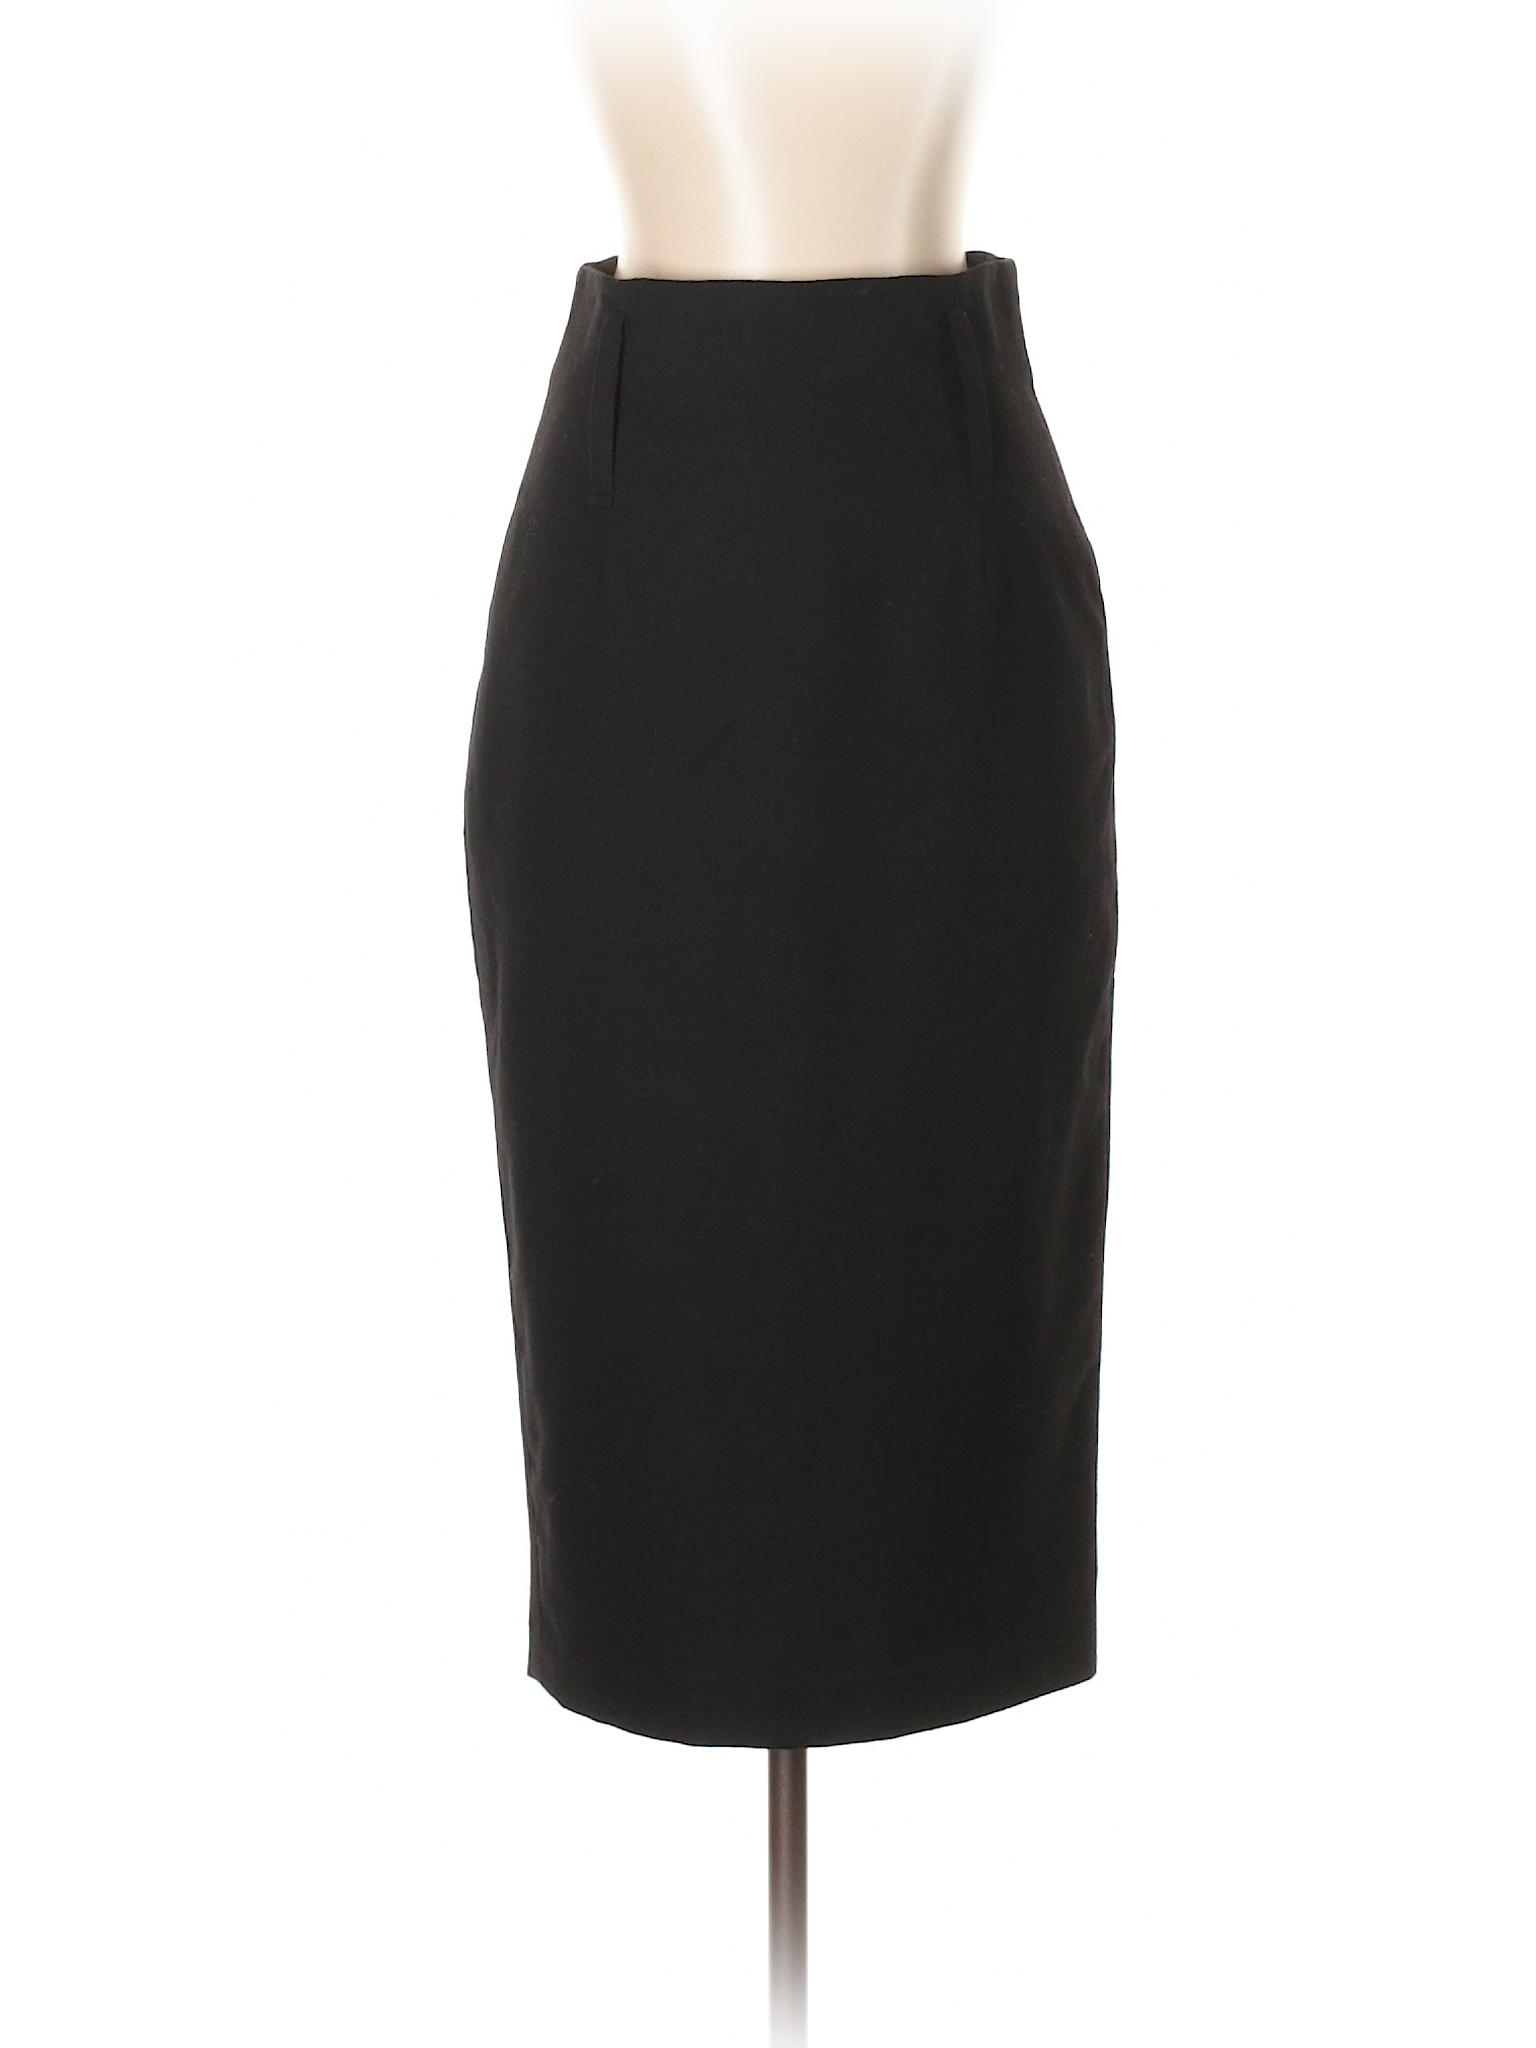 Skirt Wool Rodriguez leisure Boutique Robert qxnpCwS